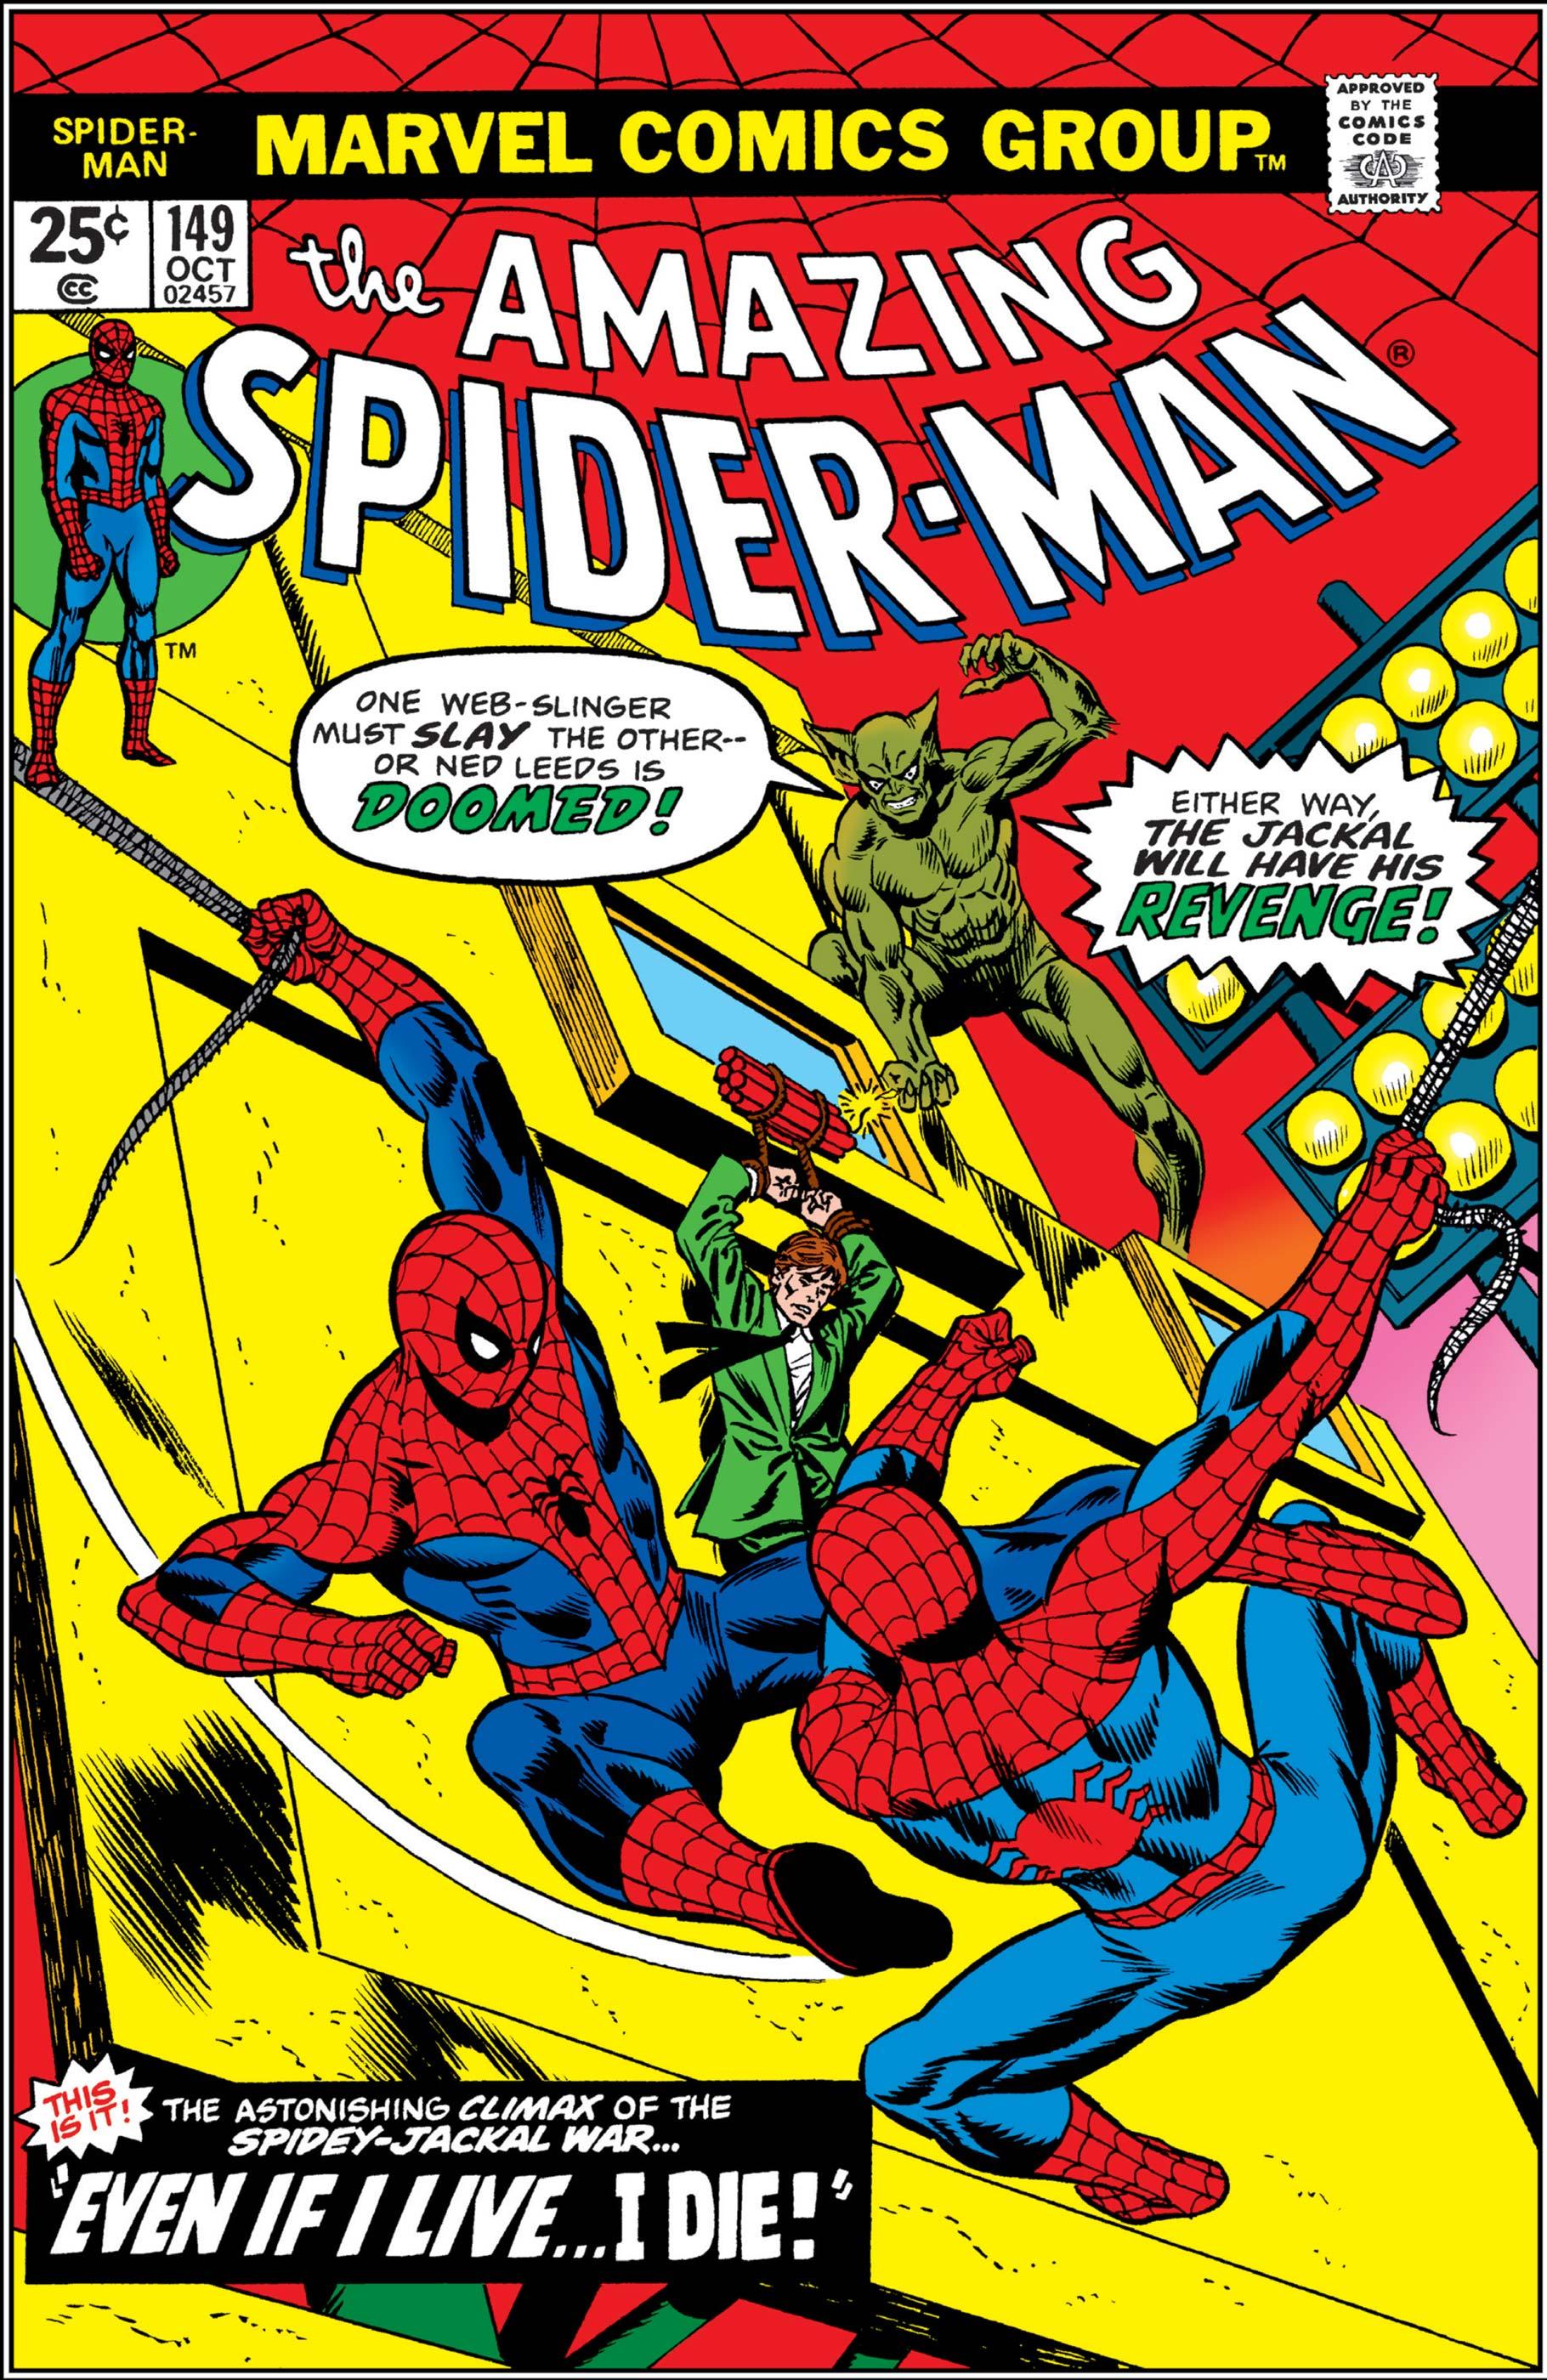 The Amazing Spider-Man (1963) #149